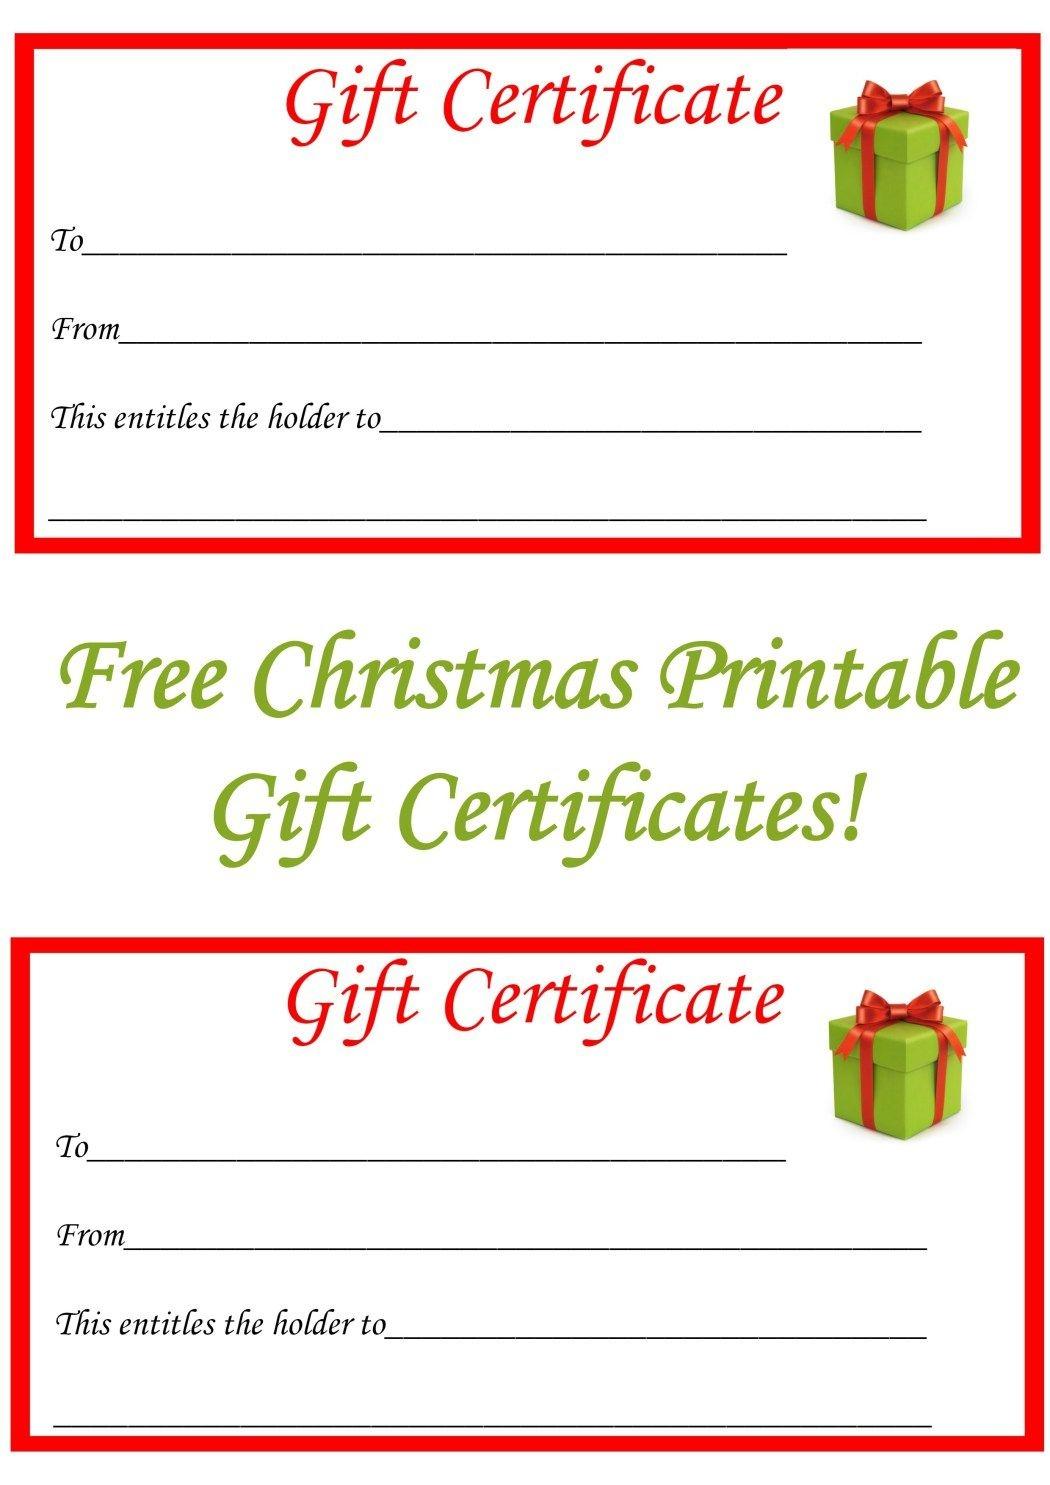 Free Christmas Printable Gift Certificates   Gift Ideas   Christmas - Free Printable Christmas Gift Voucher Templates